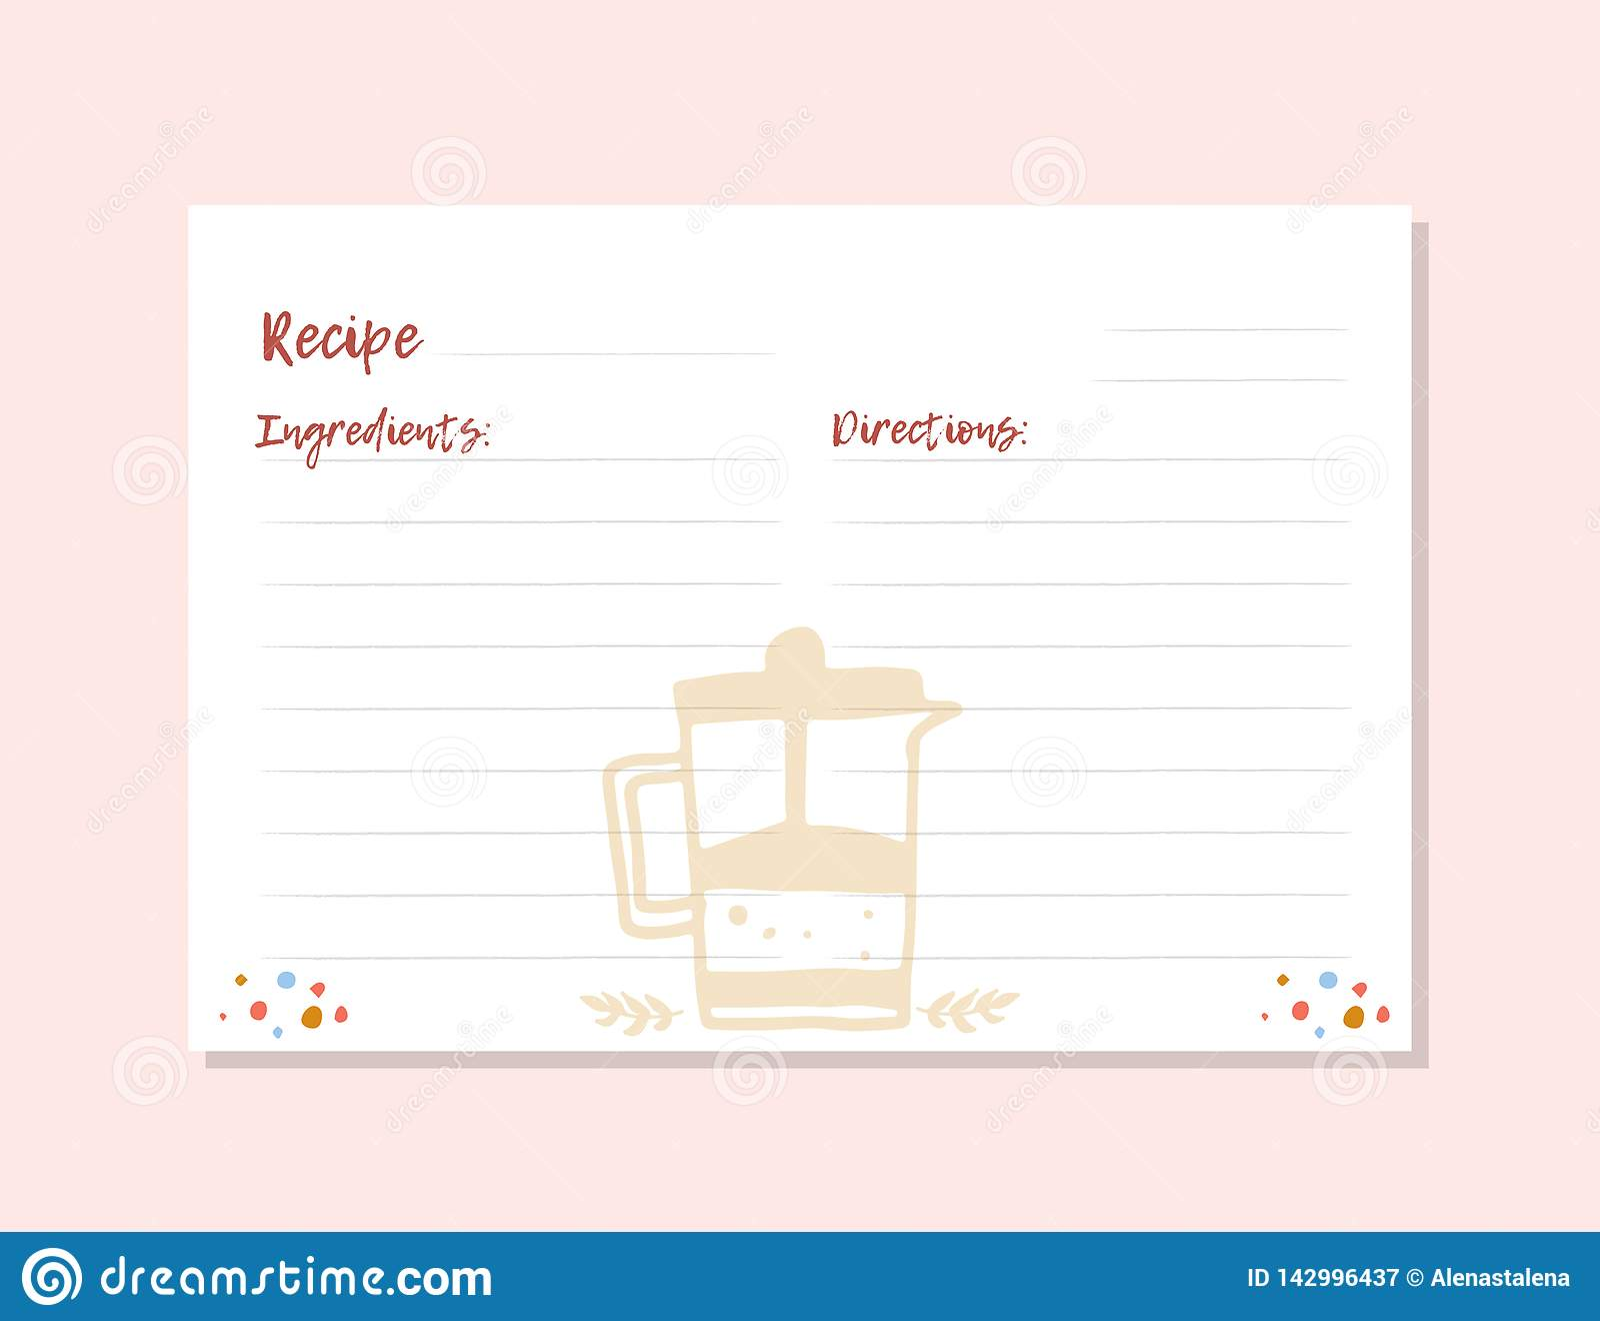 Modern Recipe Card Template For Instant Print Cookbook  A4